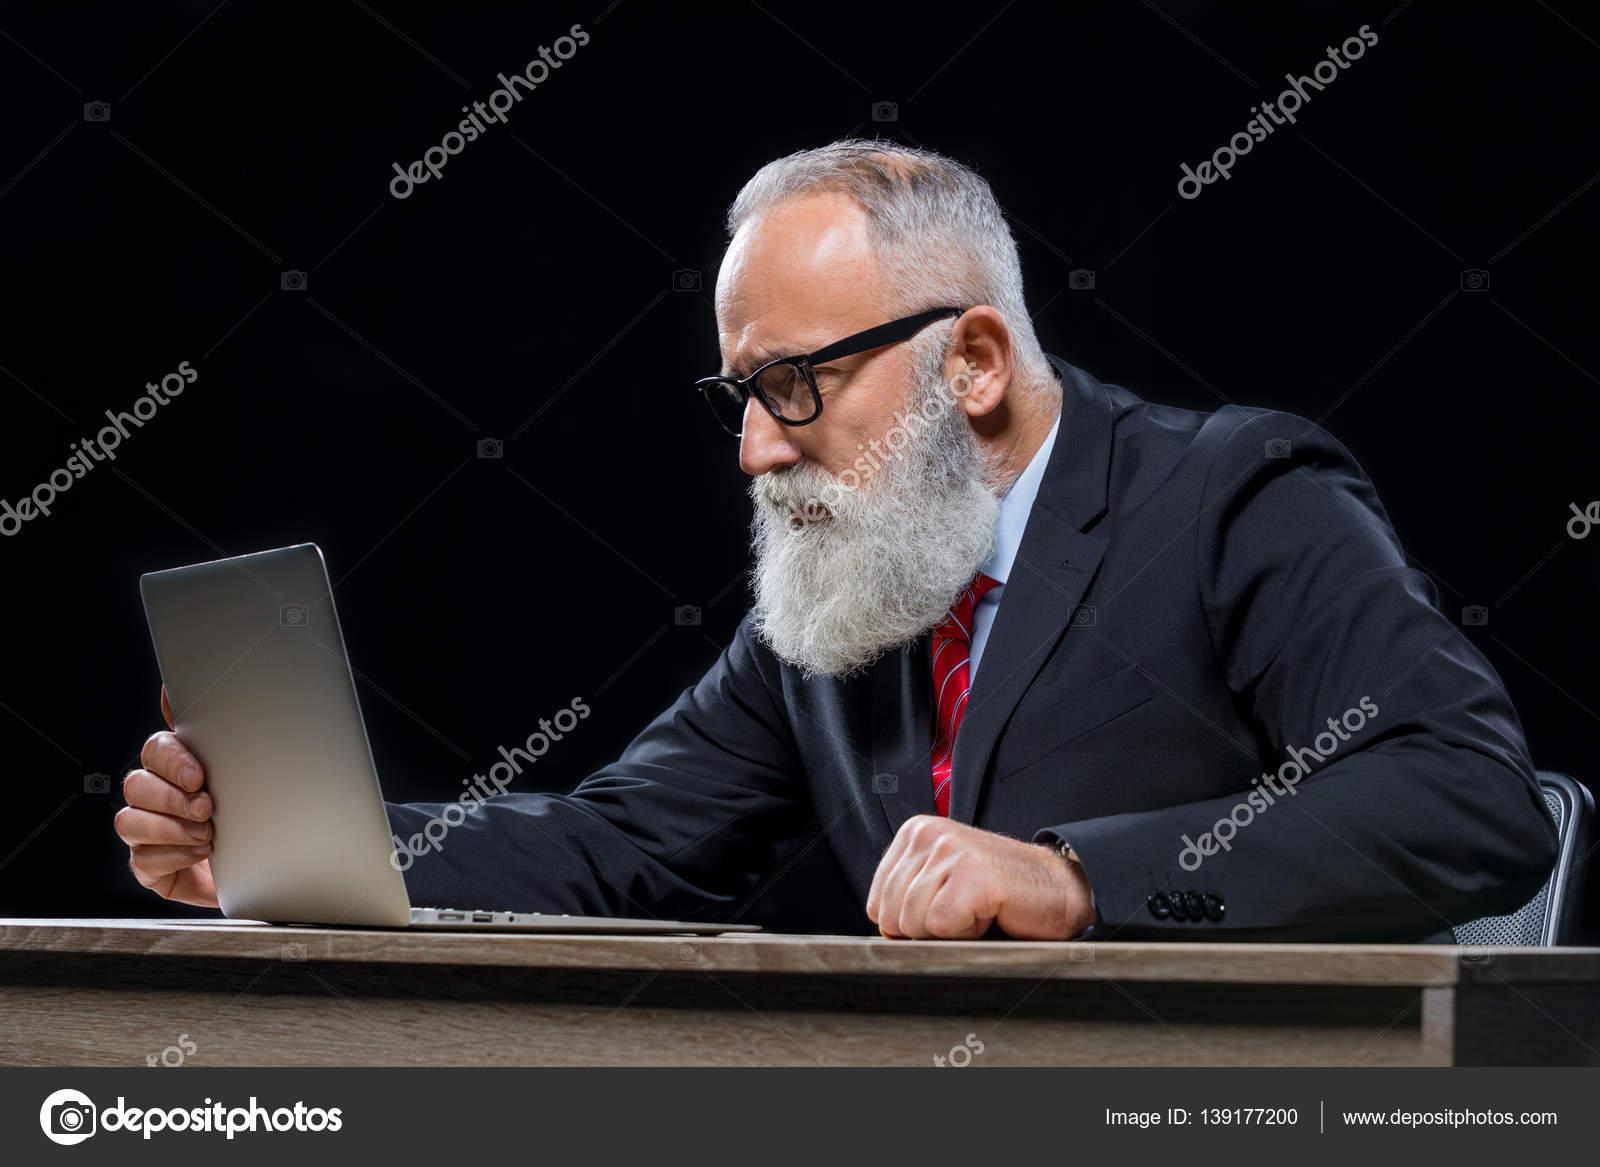 senior homme d 39 affaires avec ordinateur portable photographie olgazakrevskaya 139177200. Black Bedroom Furniture Sets. Home Design Ideas